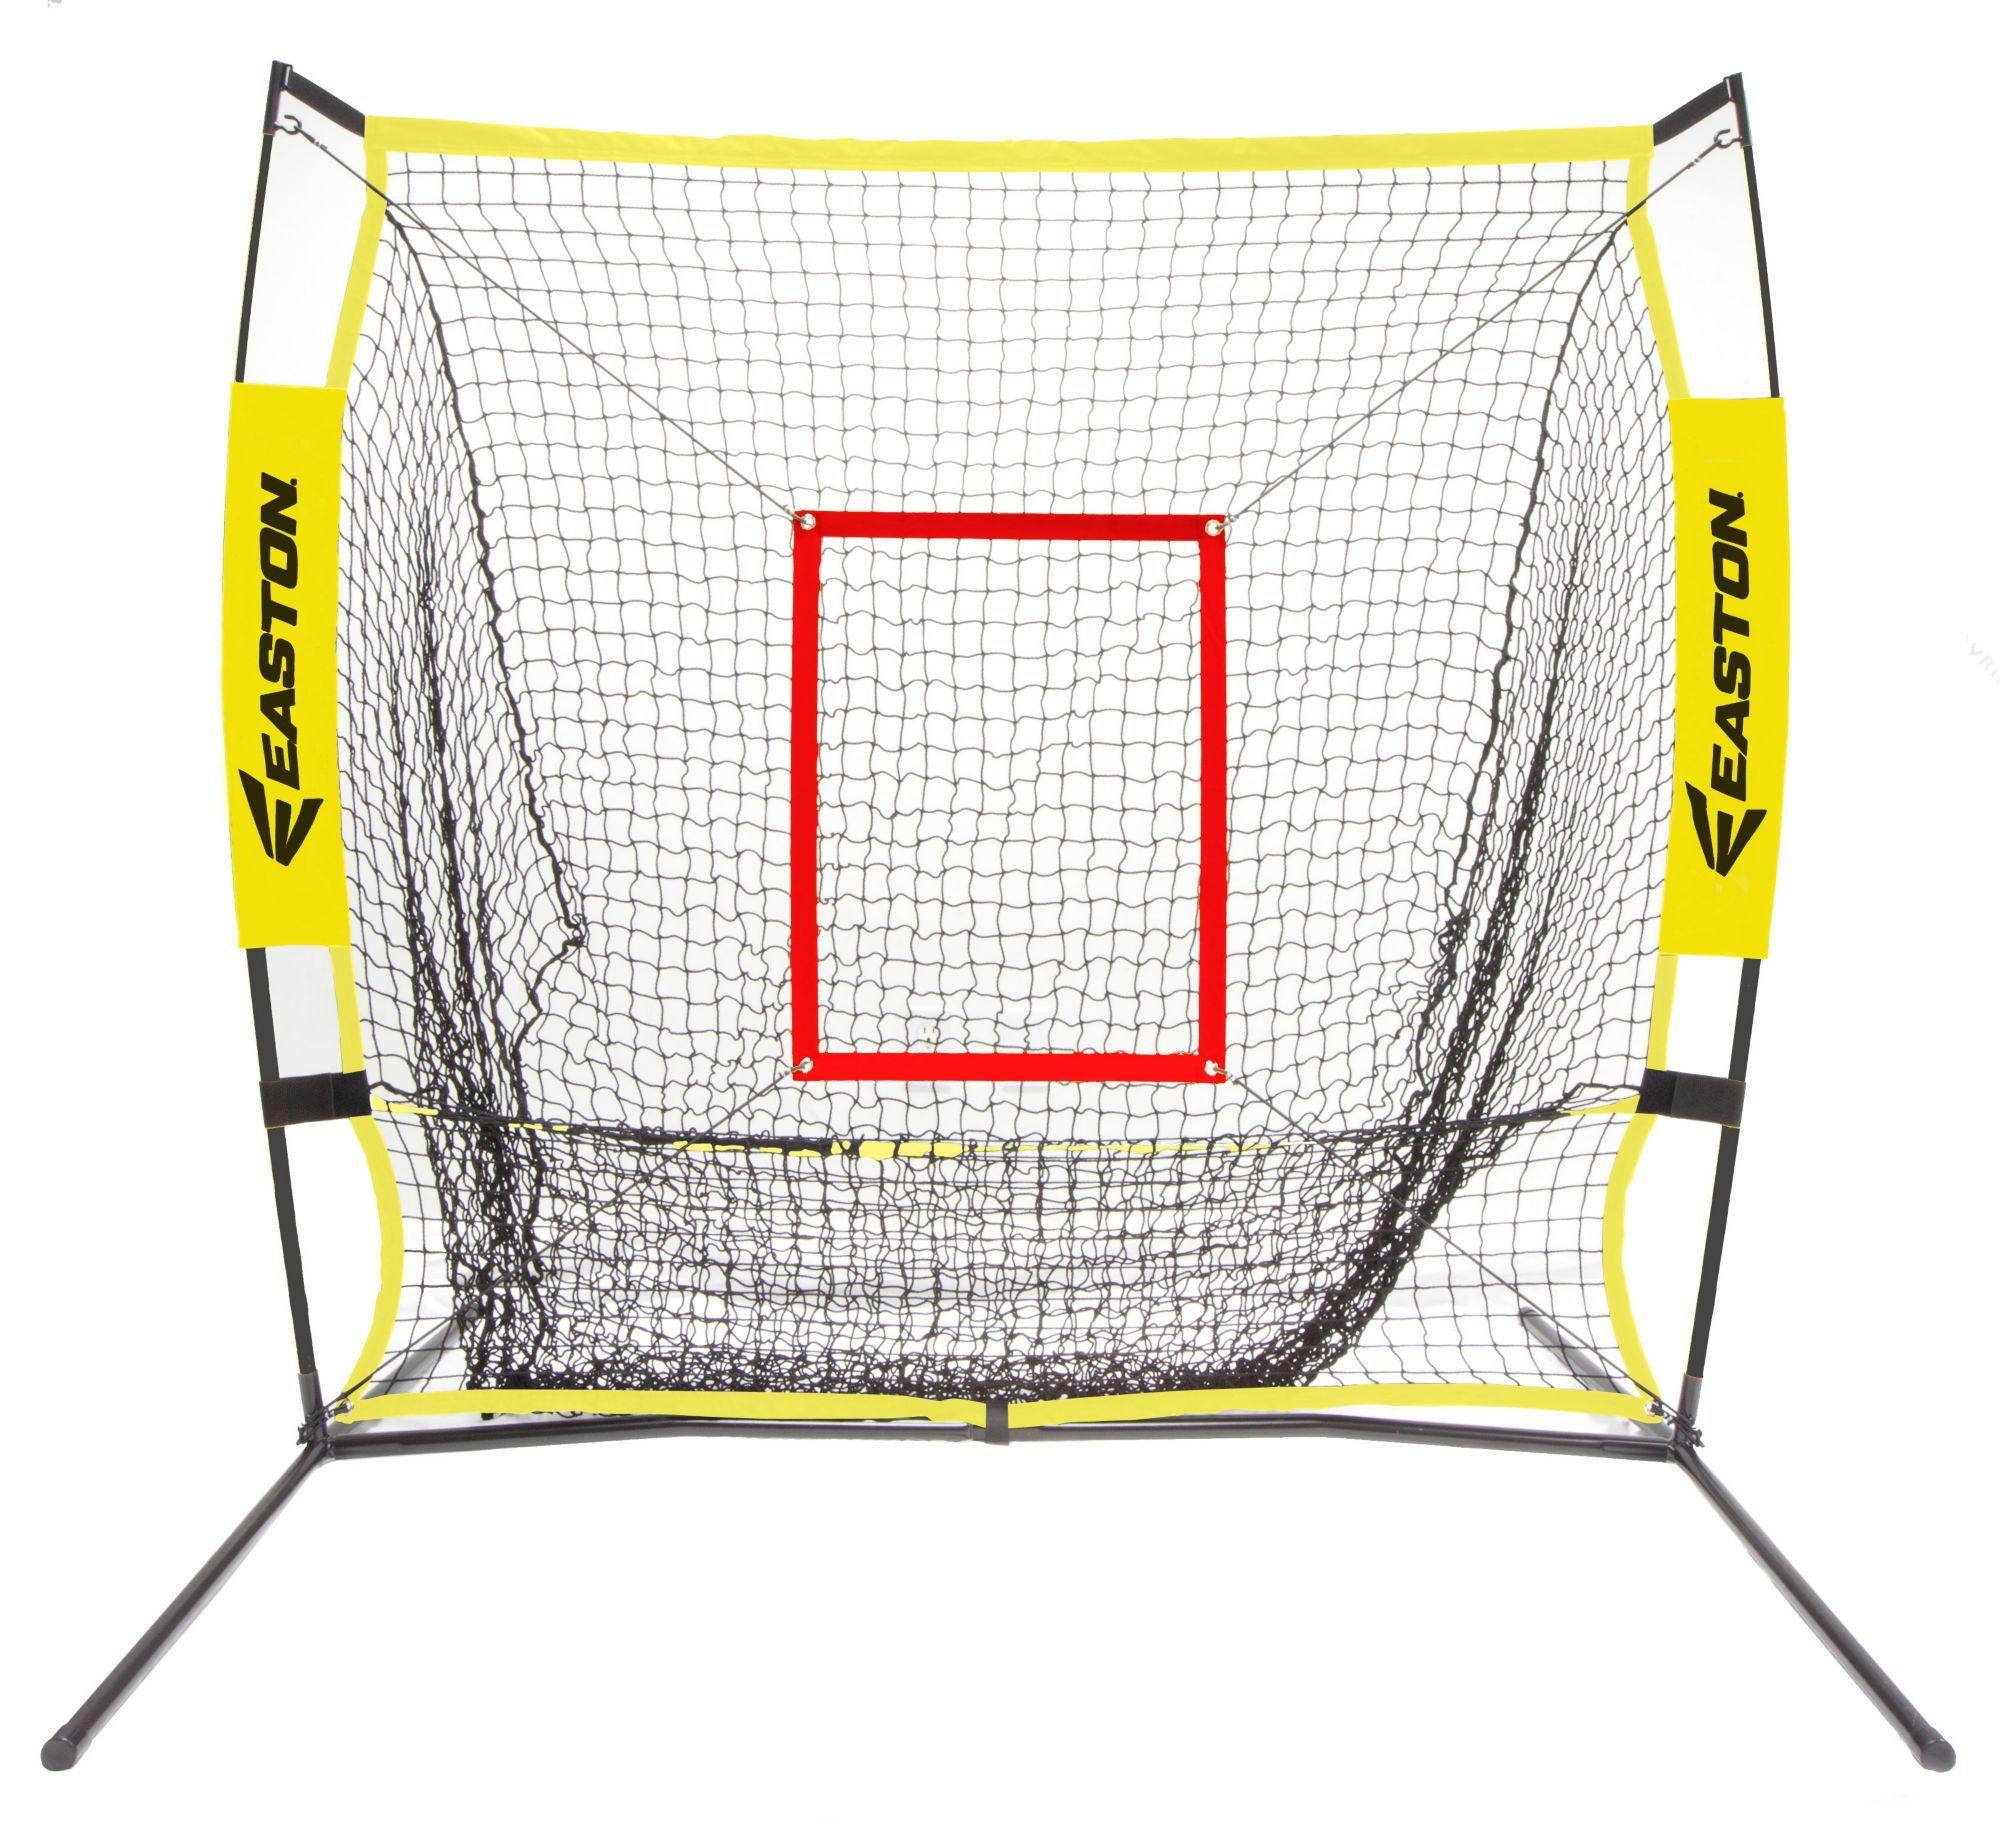 Easton Xlp 5 Training Net Baseball Pitching Softball Batting Nets